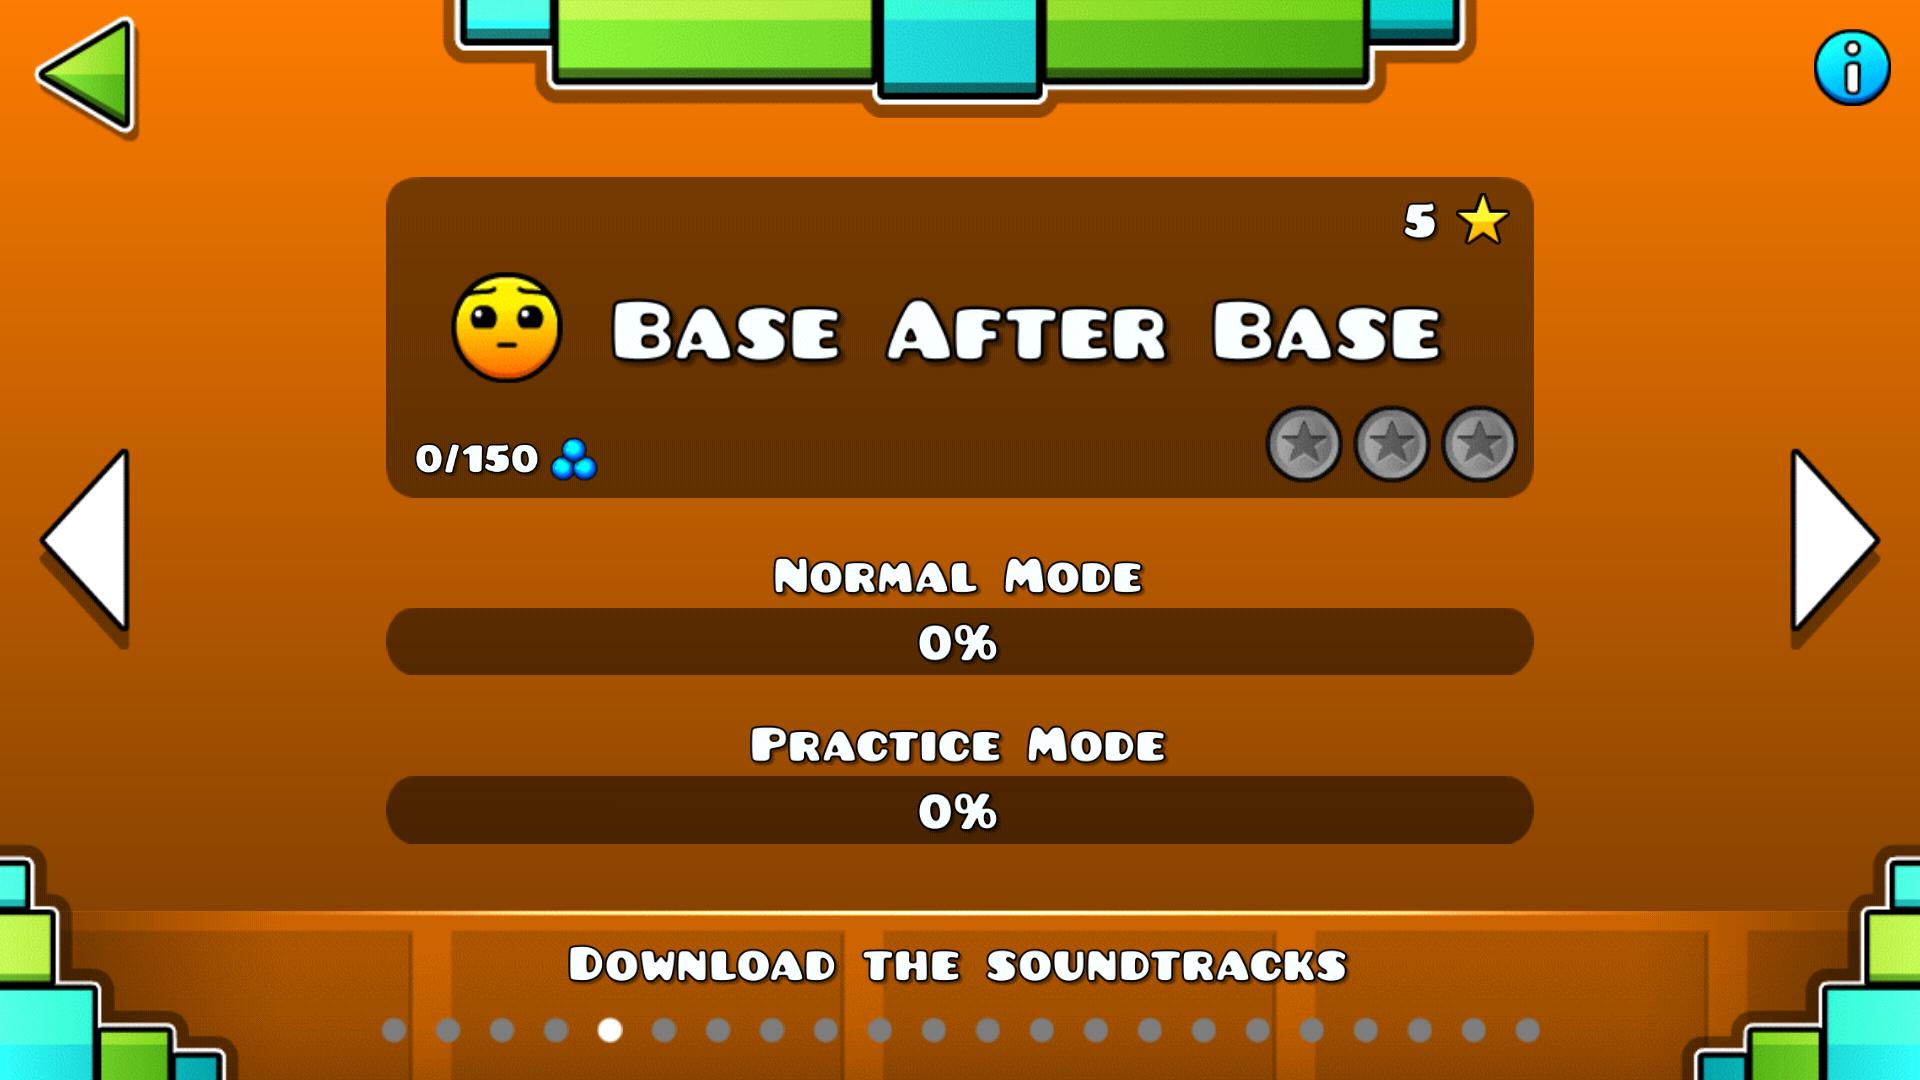 Arquivo:BaseAfterBaseMenu.png